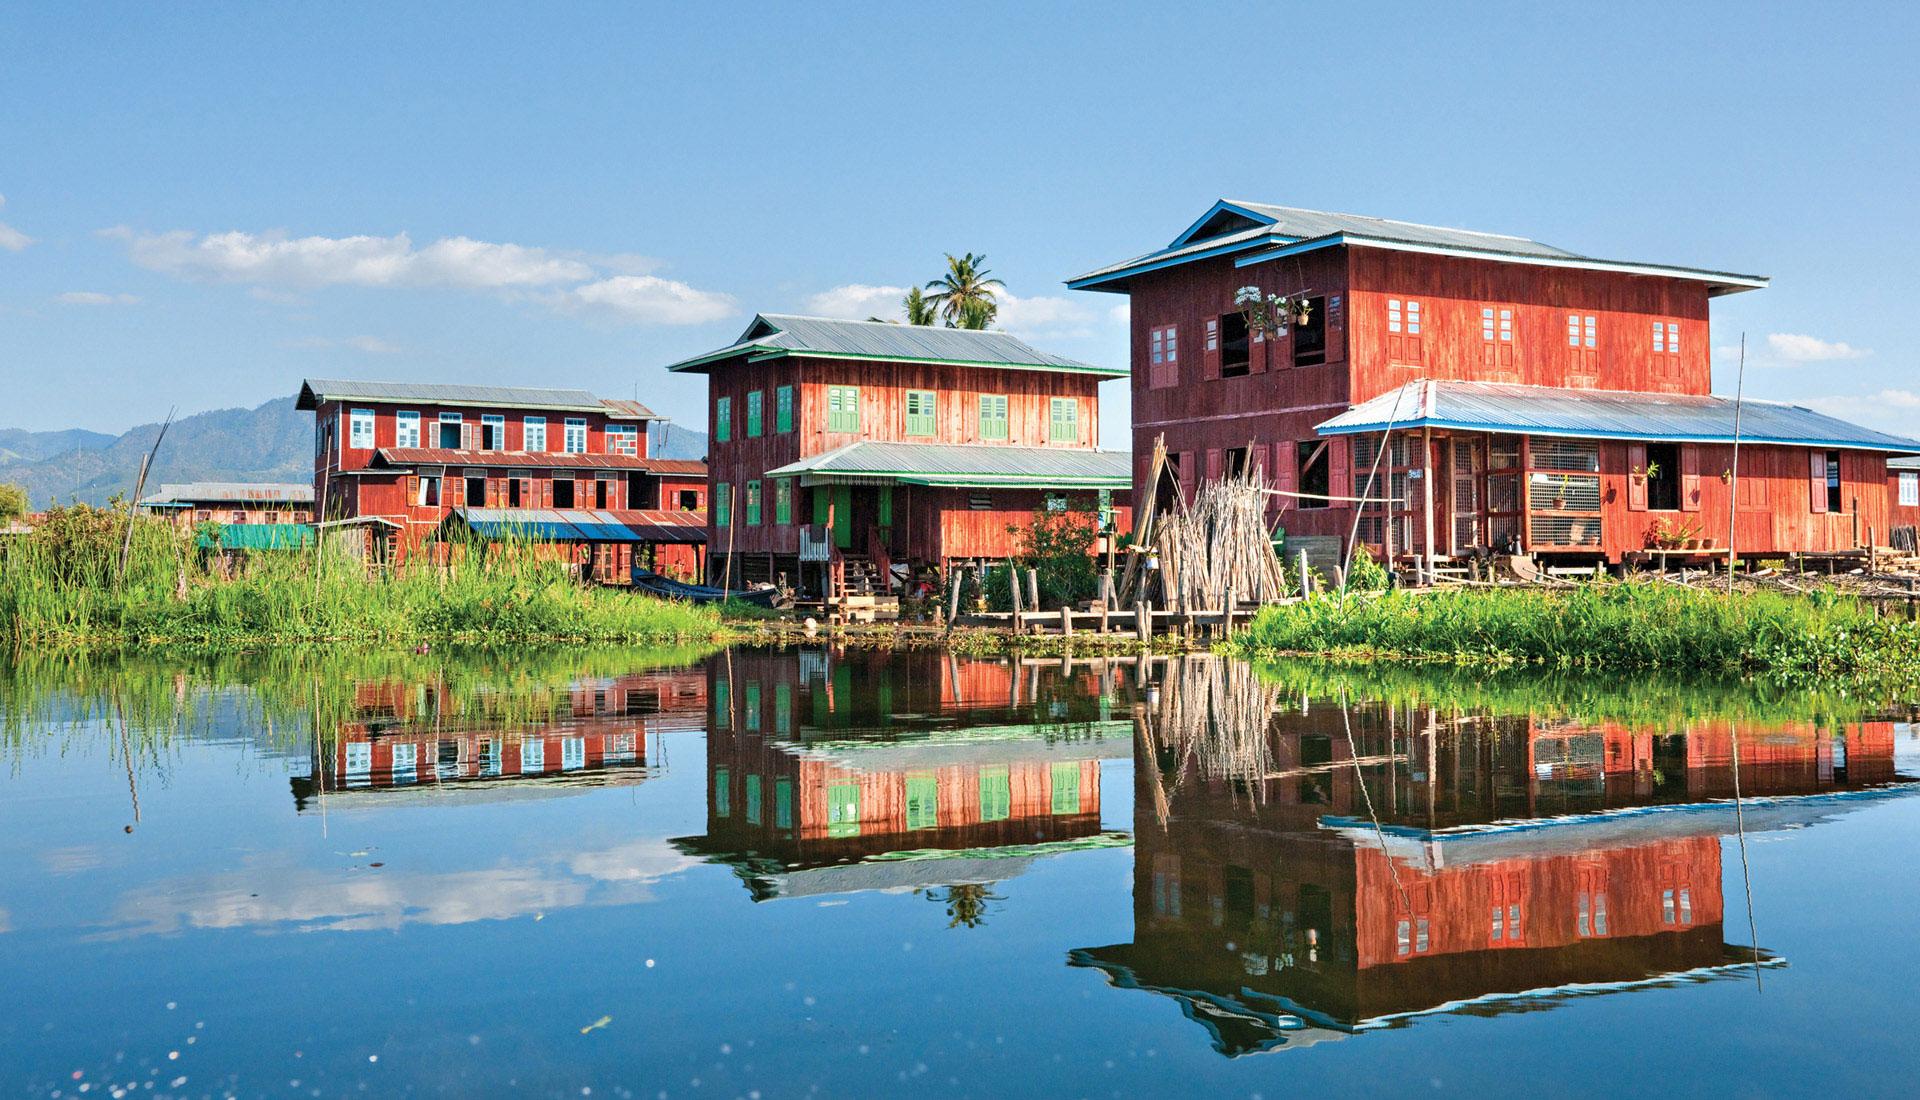 Birmanie - Traditions dans une démocratie en marche